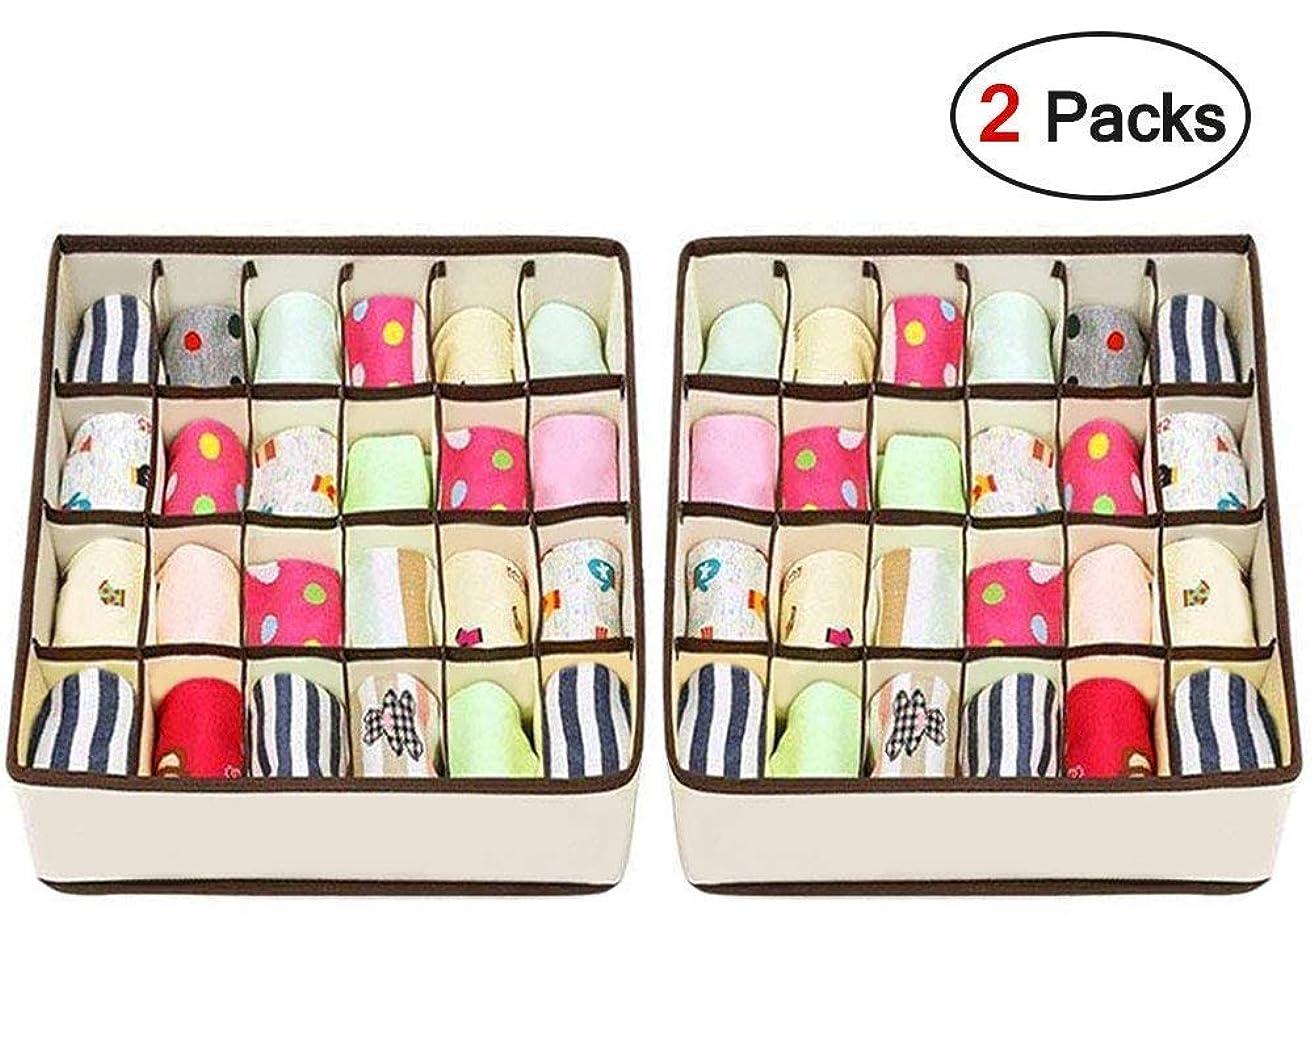 Joyoldelf Sock Drawer Organizer Divider 2 Packs Underwear Organizer, 26 Cell Collapsible Closet Cabinet Organizer Underwear Storage Boxes for Storing Socks, Bra, Handkerchiefs, Ties, Belts